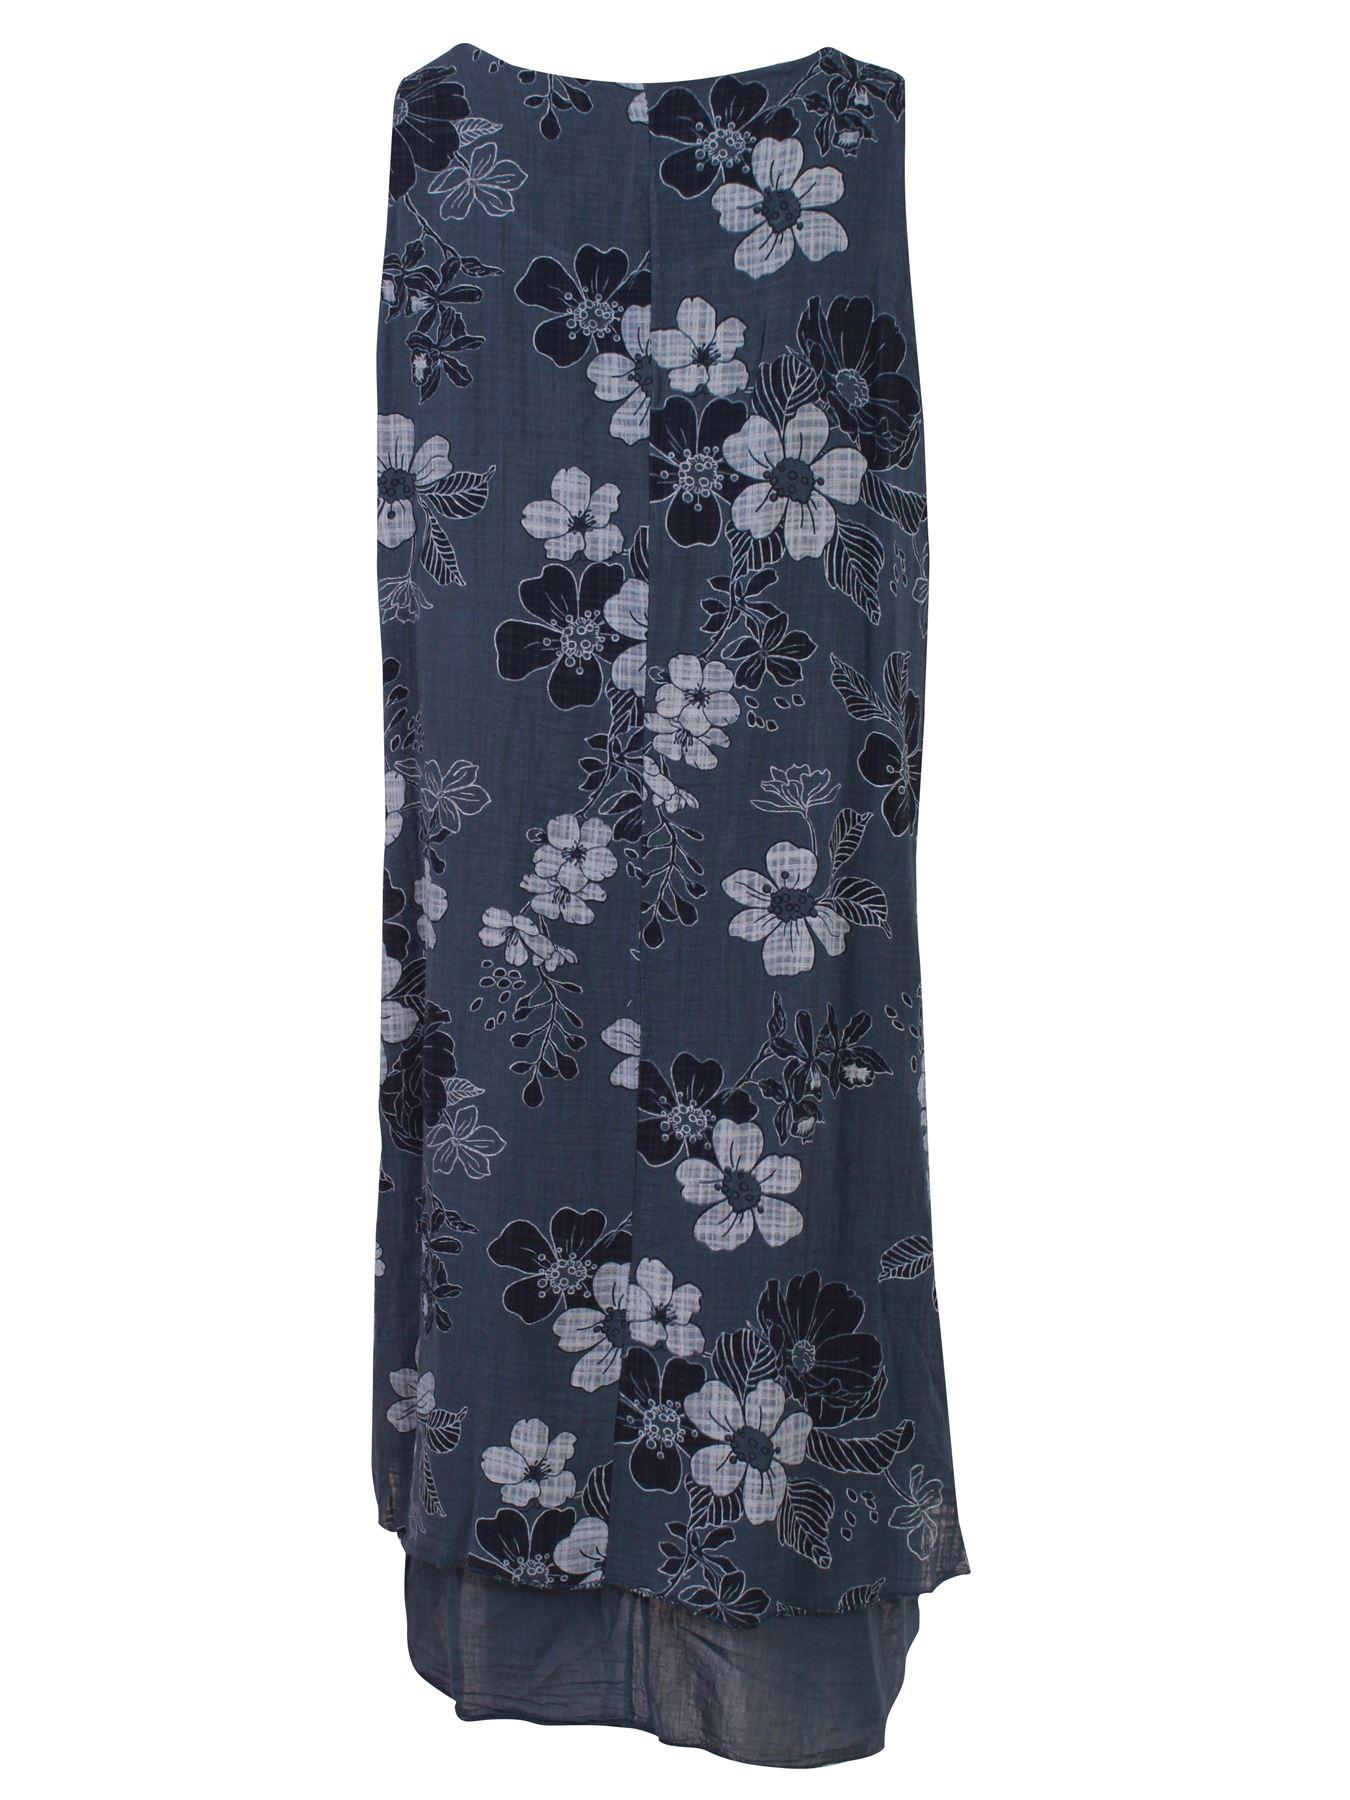 Womens-Floral-Print-Italian-Fashion-Lagenlook-Summer-Cotton-Crew-Neck-Dress thumbnail 12